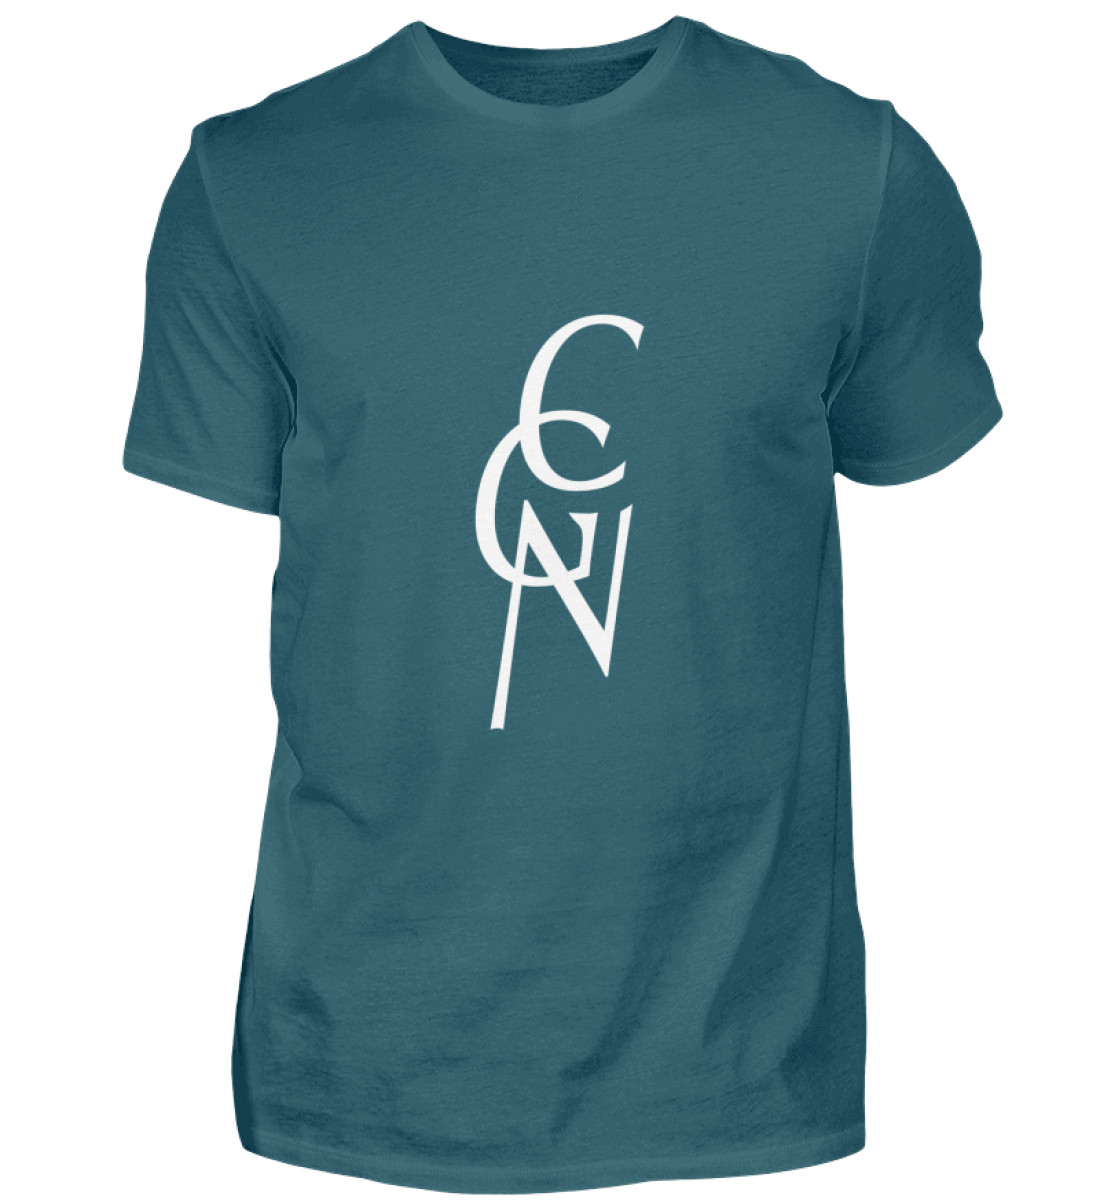 CGN - T-Shirt Herren - Herren Shirt-1096